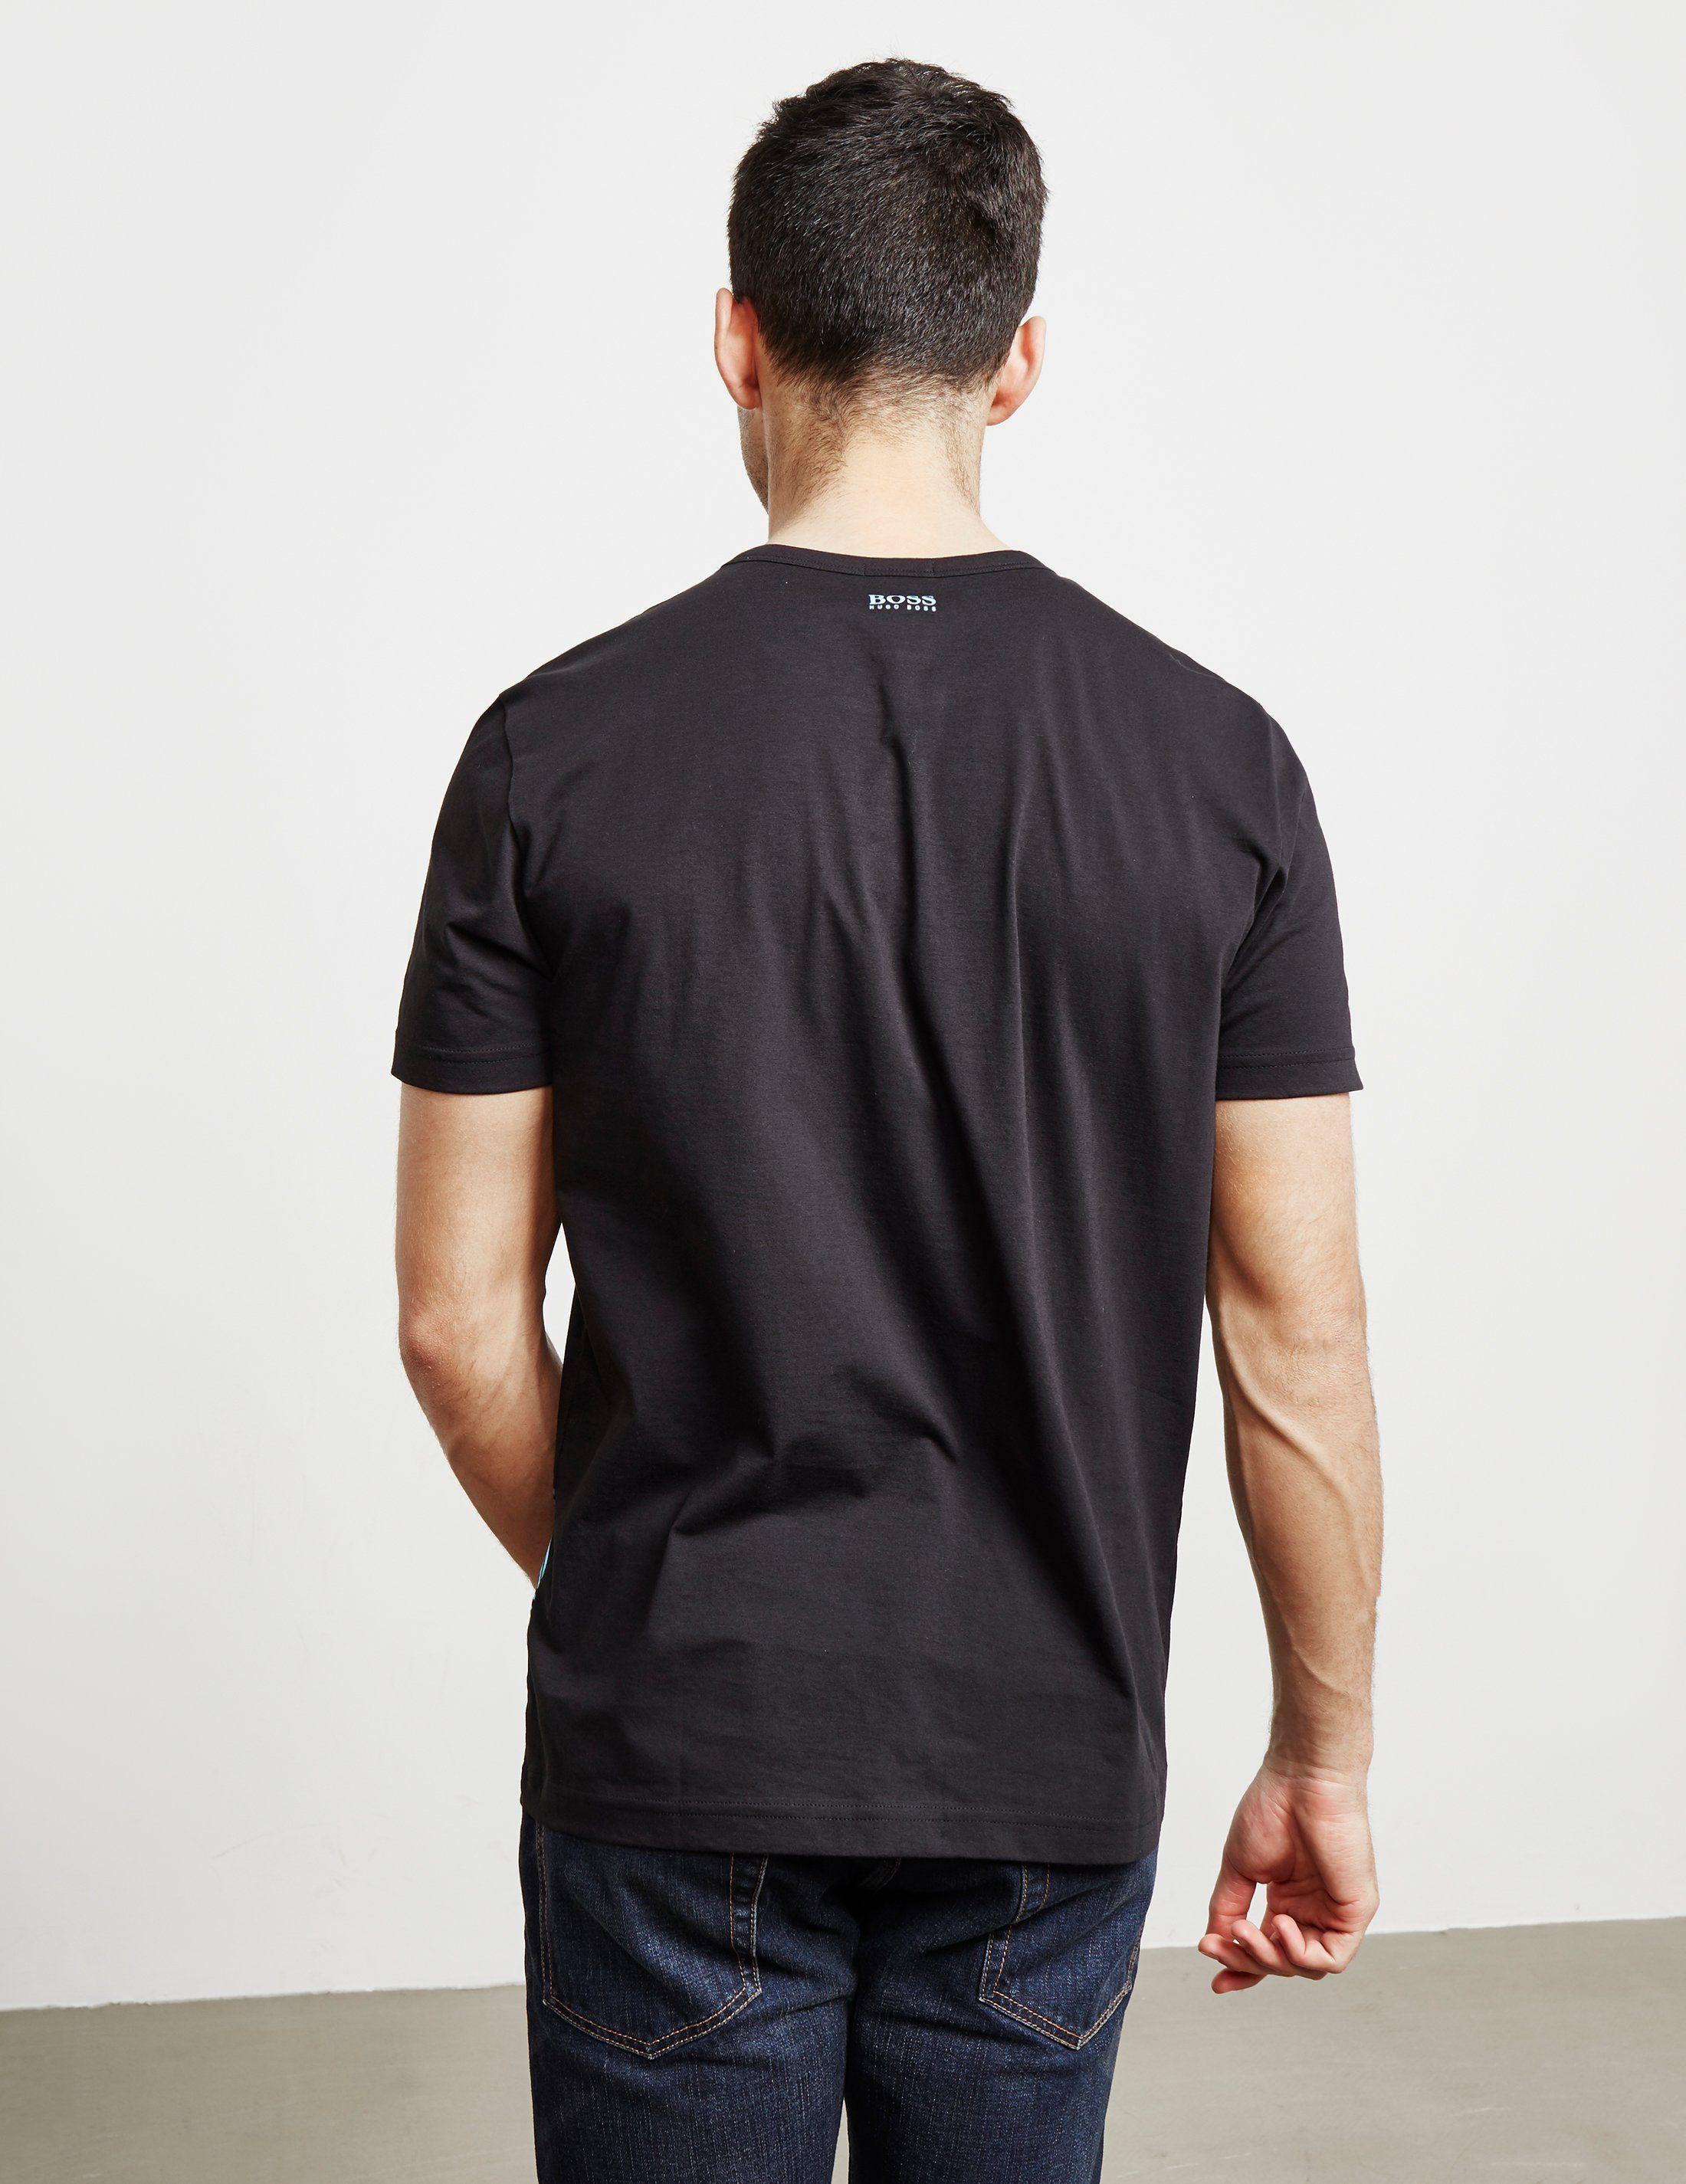 BOSS Graphic Logo Short Sleeve T-Shirt